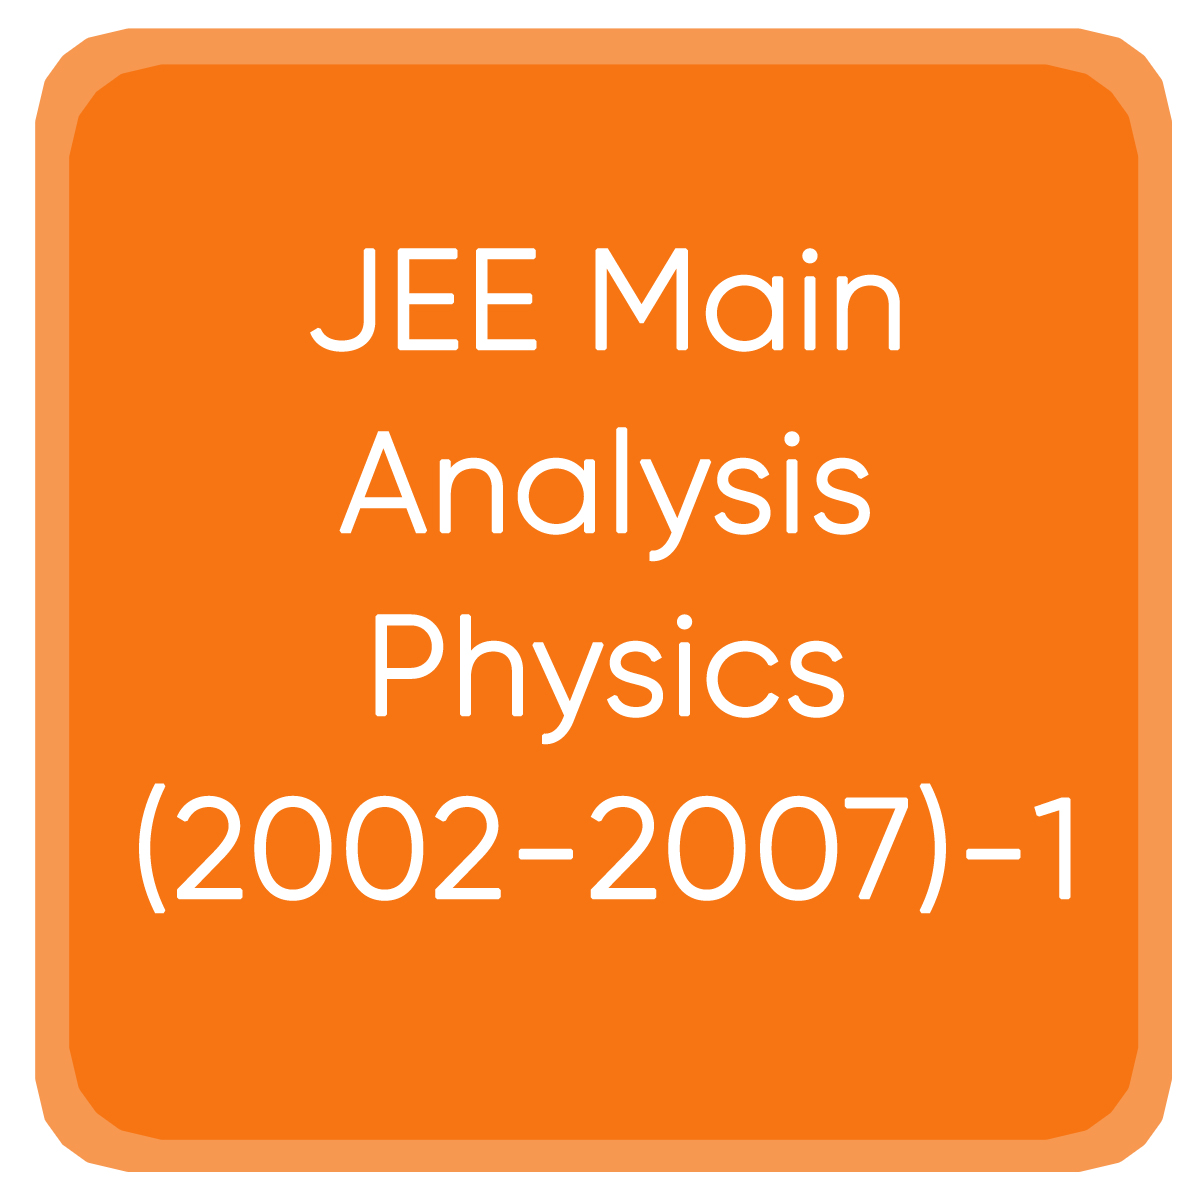 JEE Main Analysis Physics(2002-2007)-1